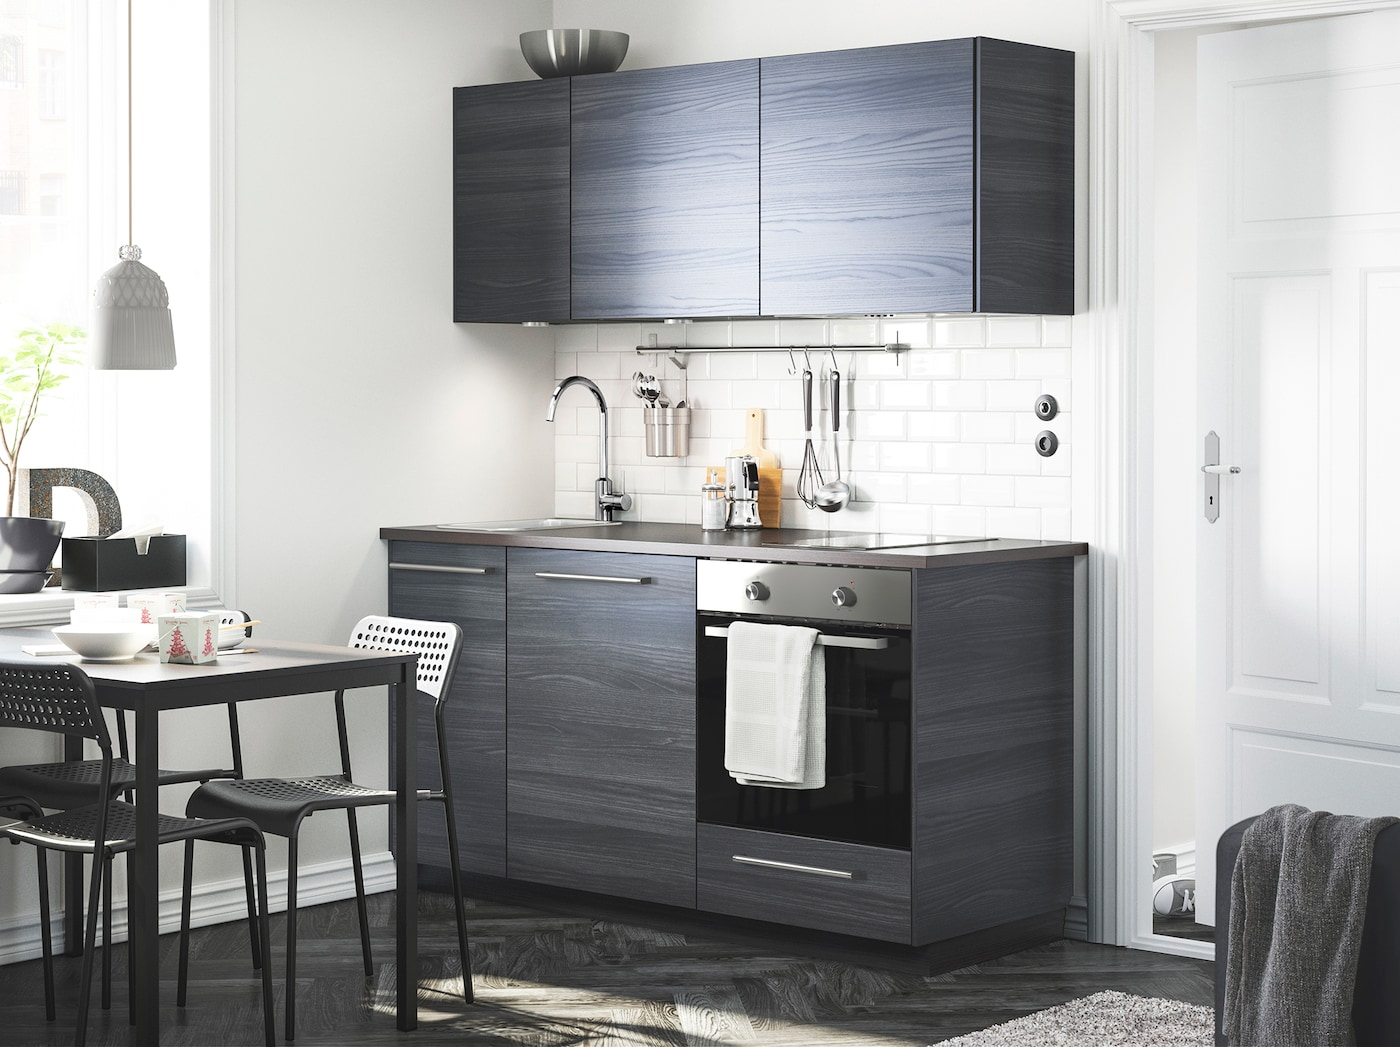 Outdoor Küche Ikea Family : Inspiration schwarze dunkle küchen ikea